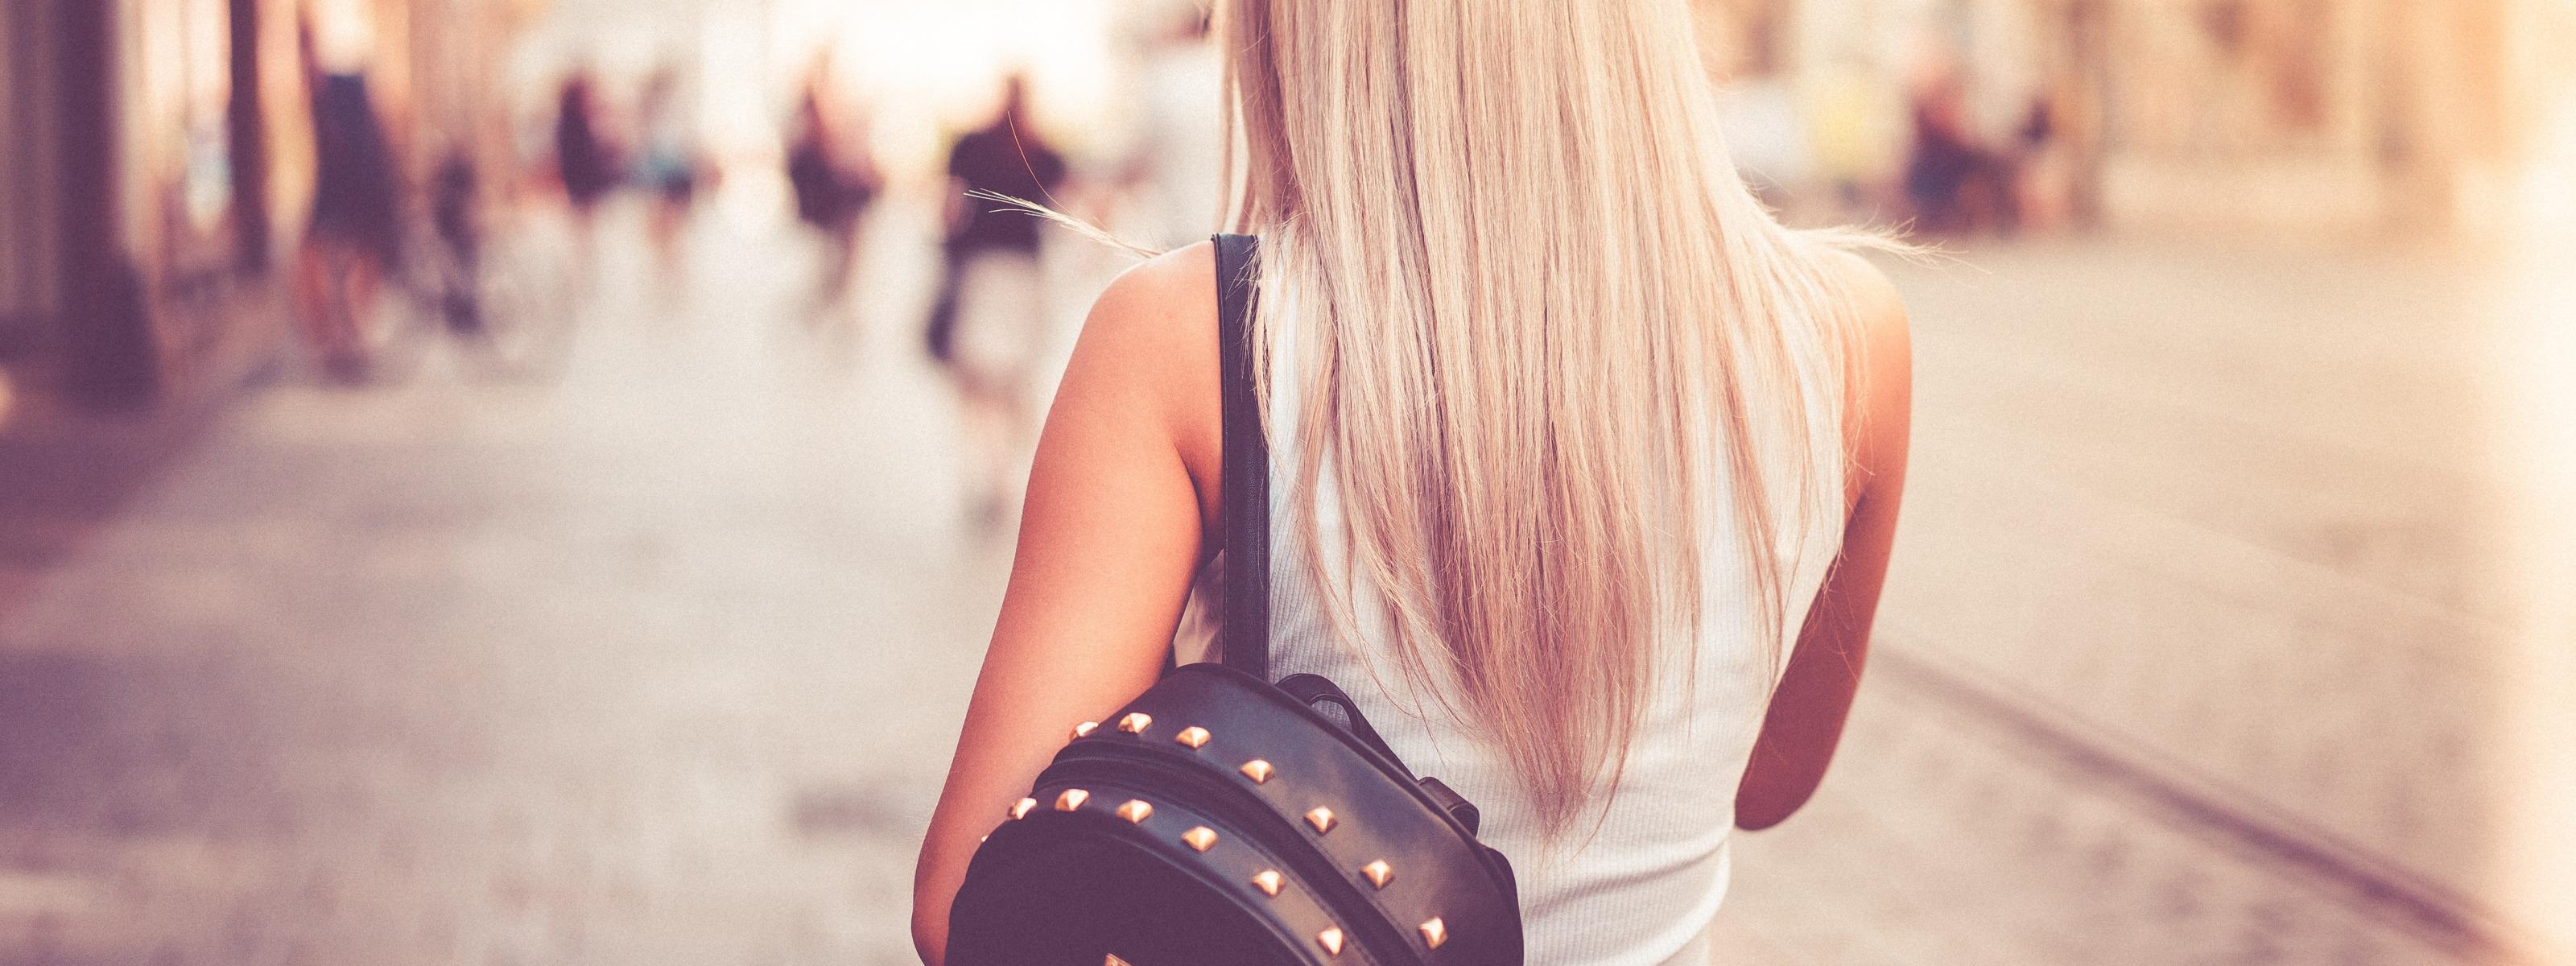 картинки девушек сзади блондинка личном